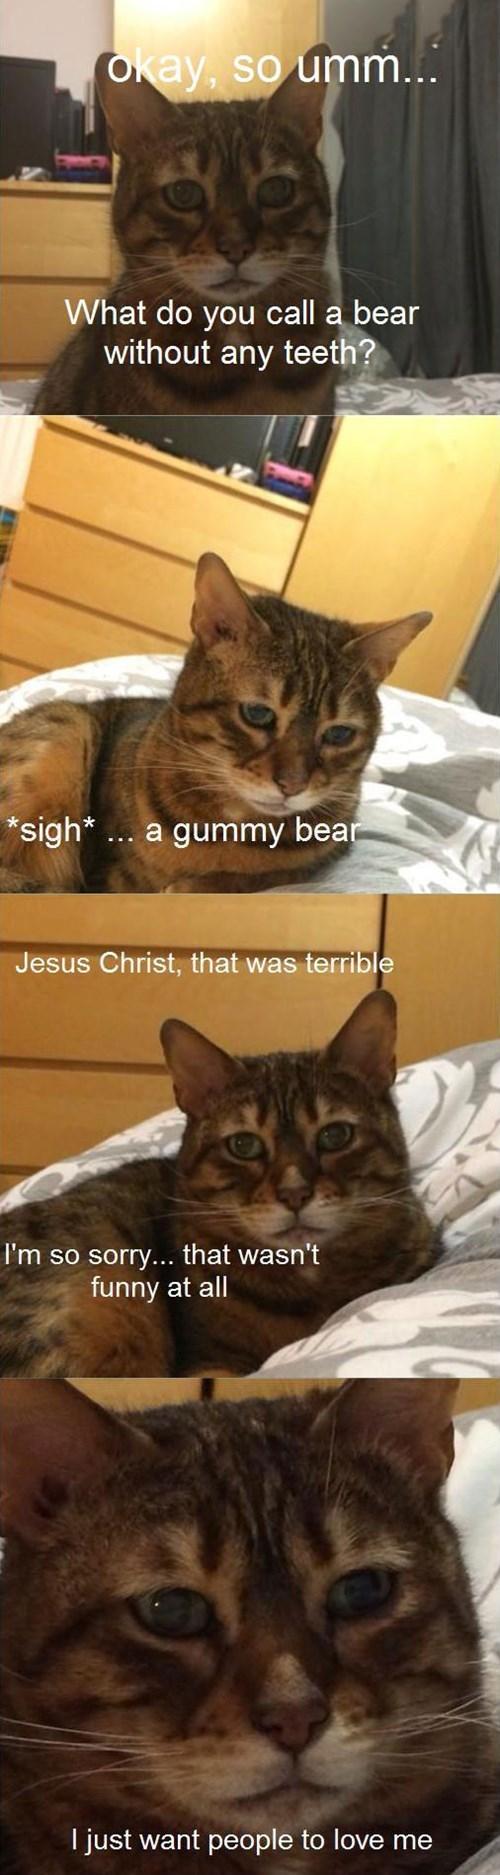 Sad bad jokes desperate Cats - 8111648512